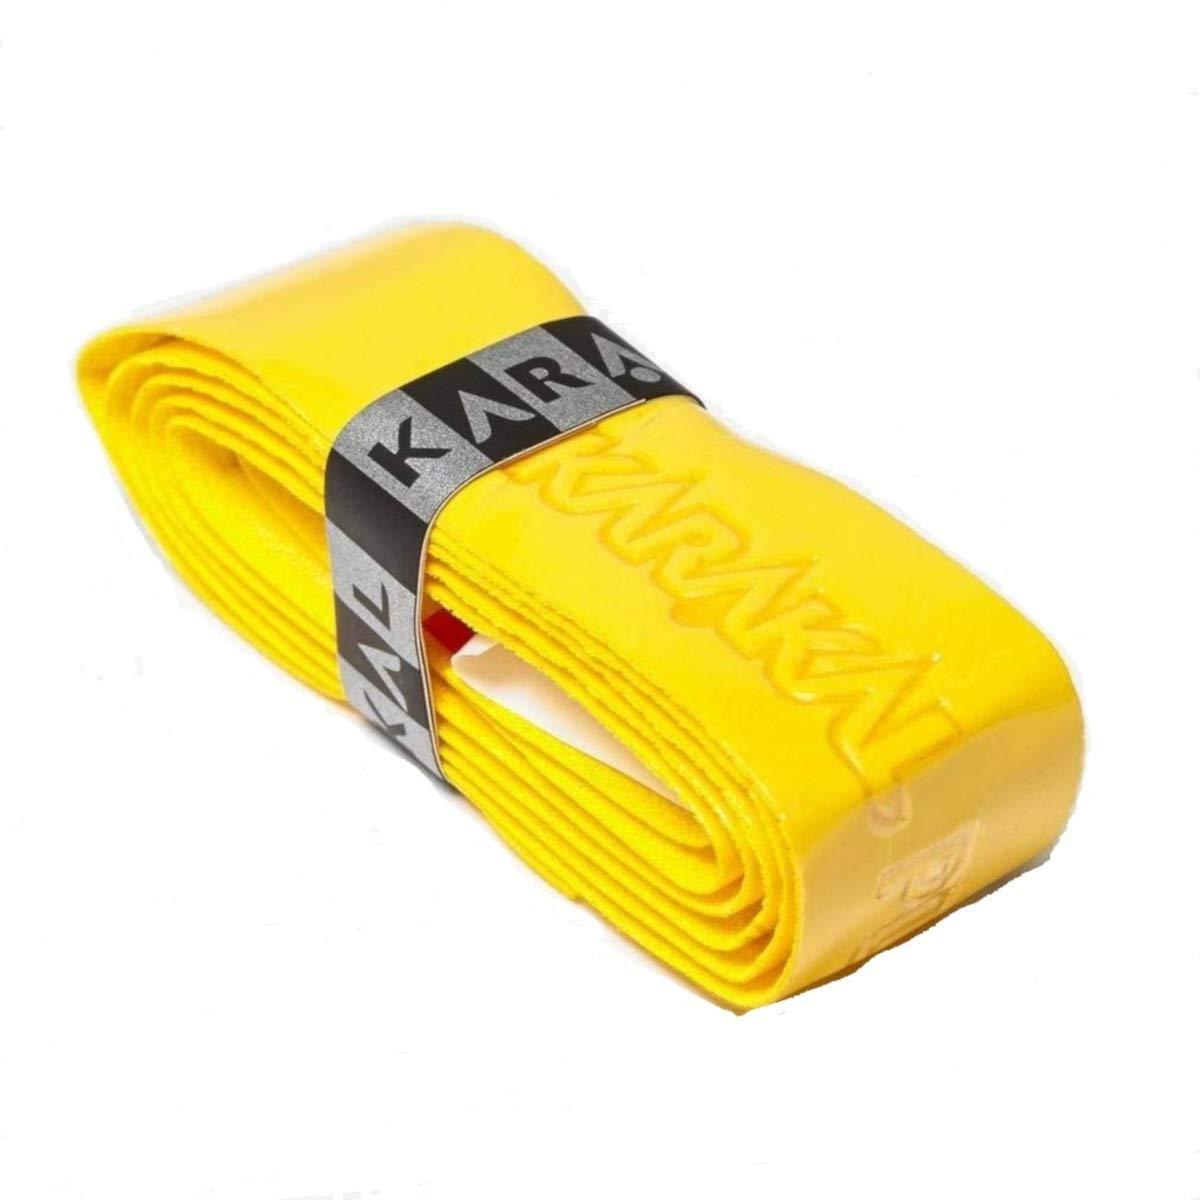 Karakal PU Super Grip Box 24 Replacement Grip-Yellow